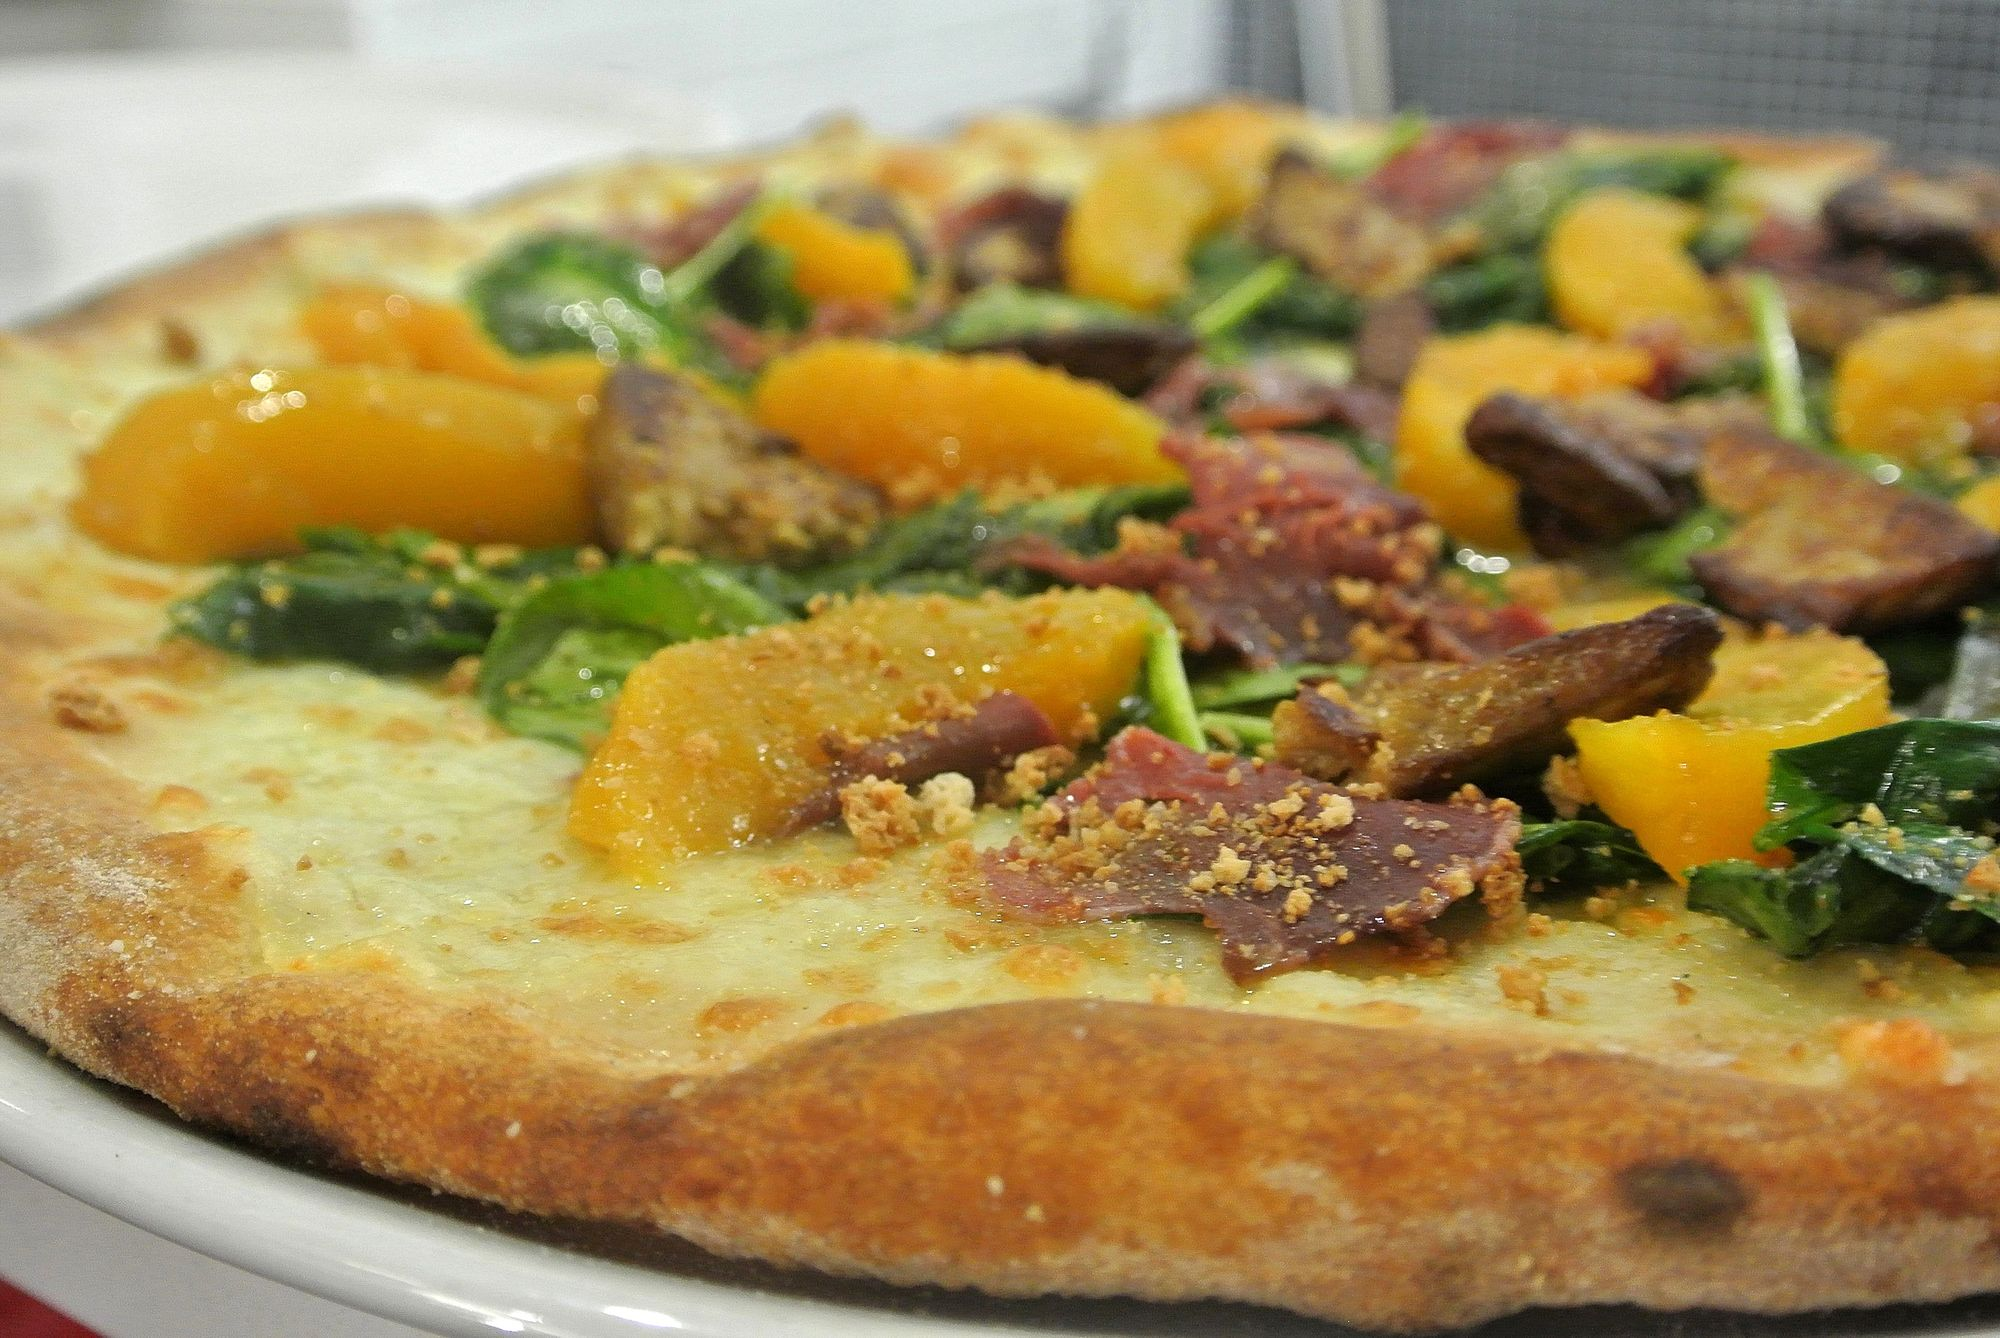 Tre pizze gourmet da provare a roma - Pizzeria con giardino roma ...